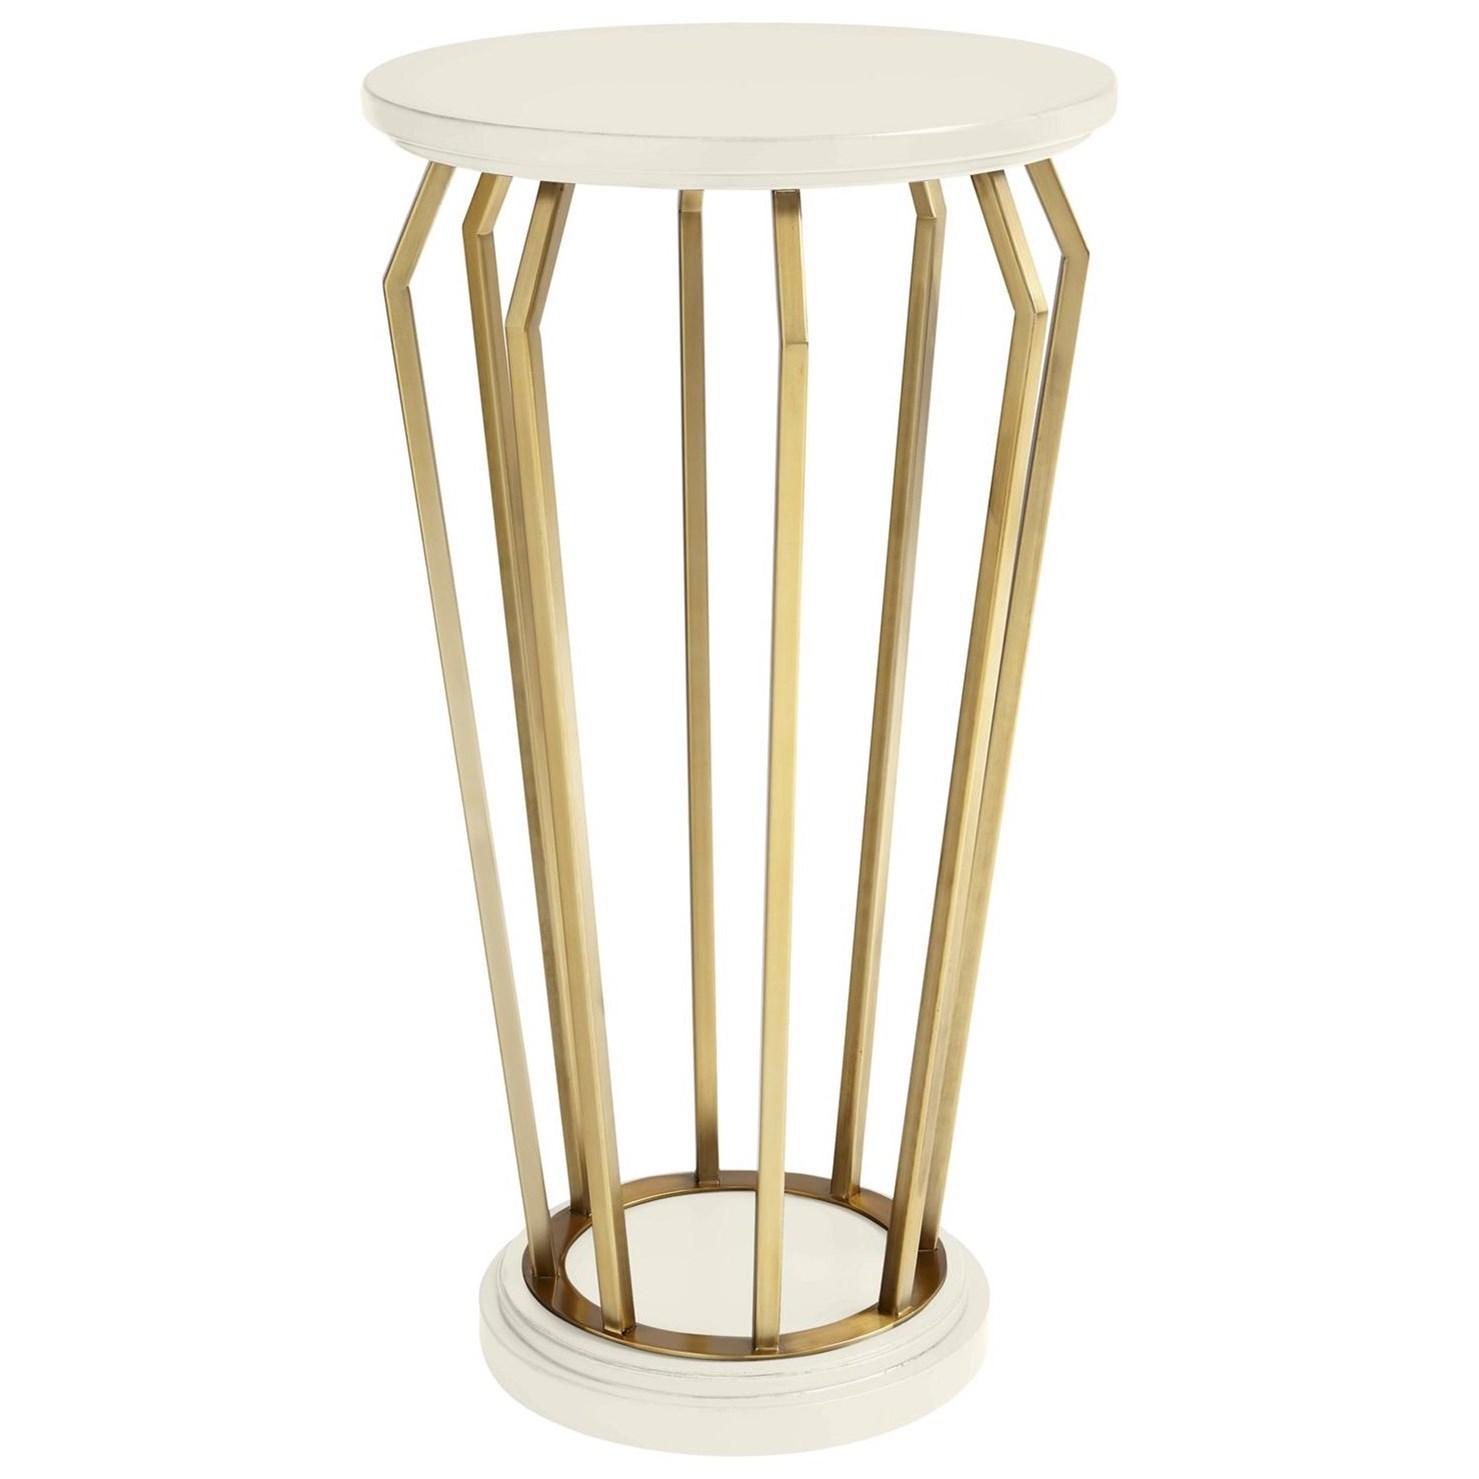 Stanley Furniture Coastal Living Oasis Manzanita Martini Table - Item Number: 527-25-16